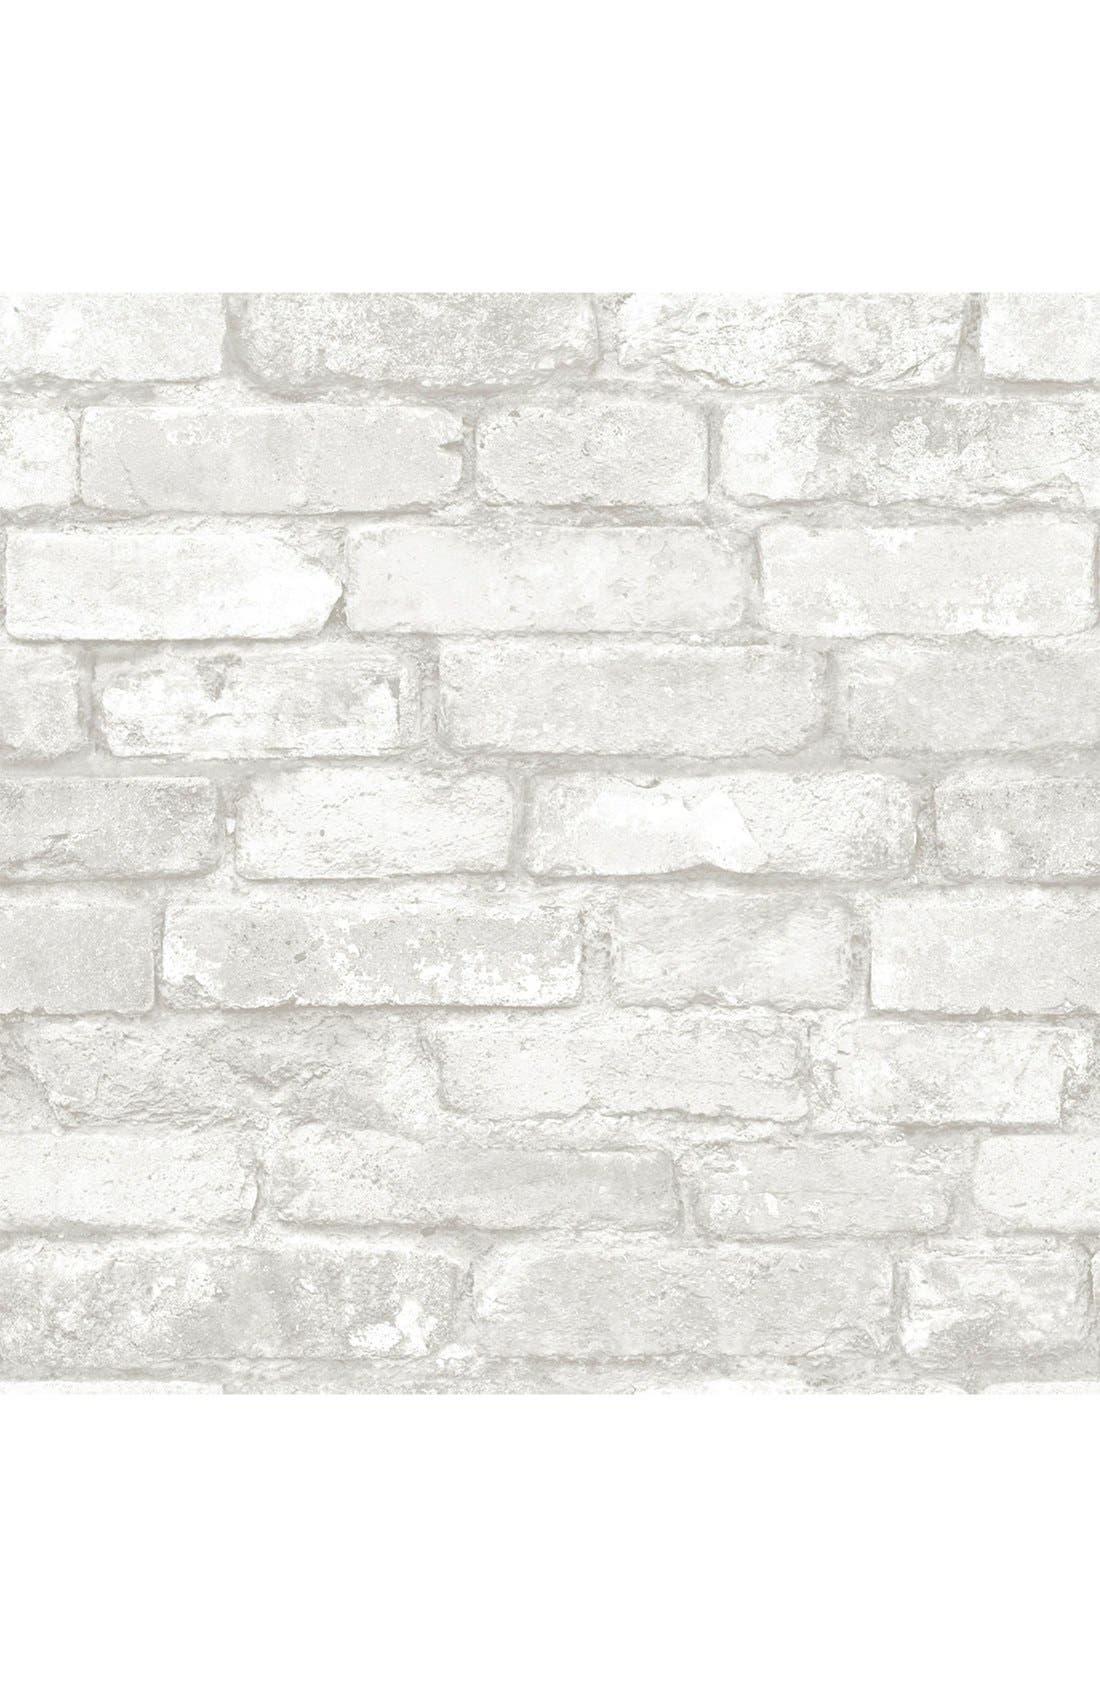 Main Image - Wallpops 'Grey & White Brick' Reusable Peel & Stick Vinyl Wallpaper